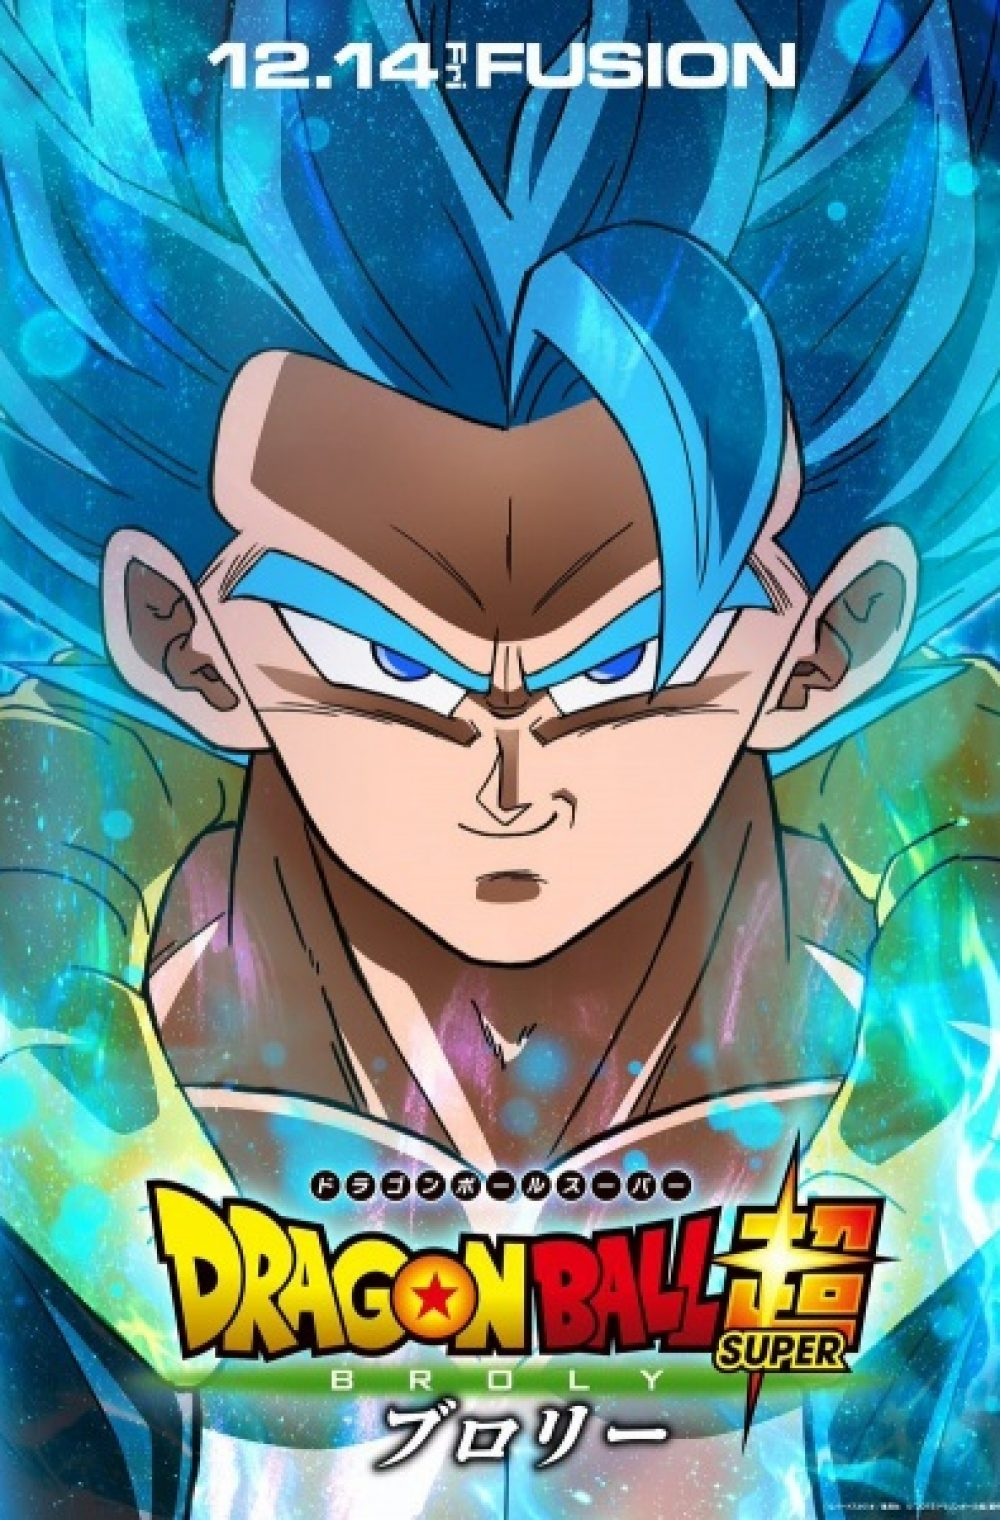 (DUB) Dragon Ball Super: Broly